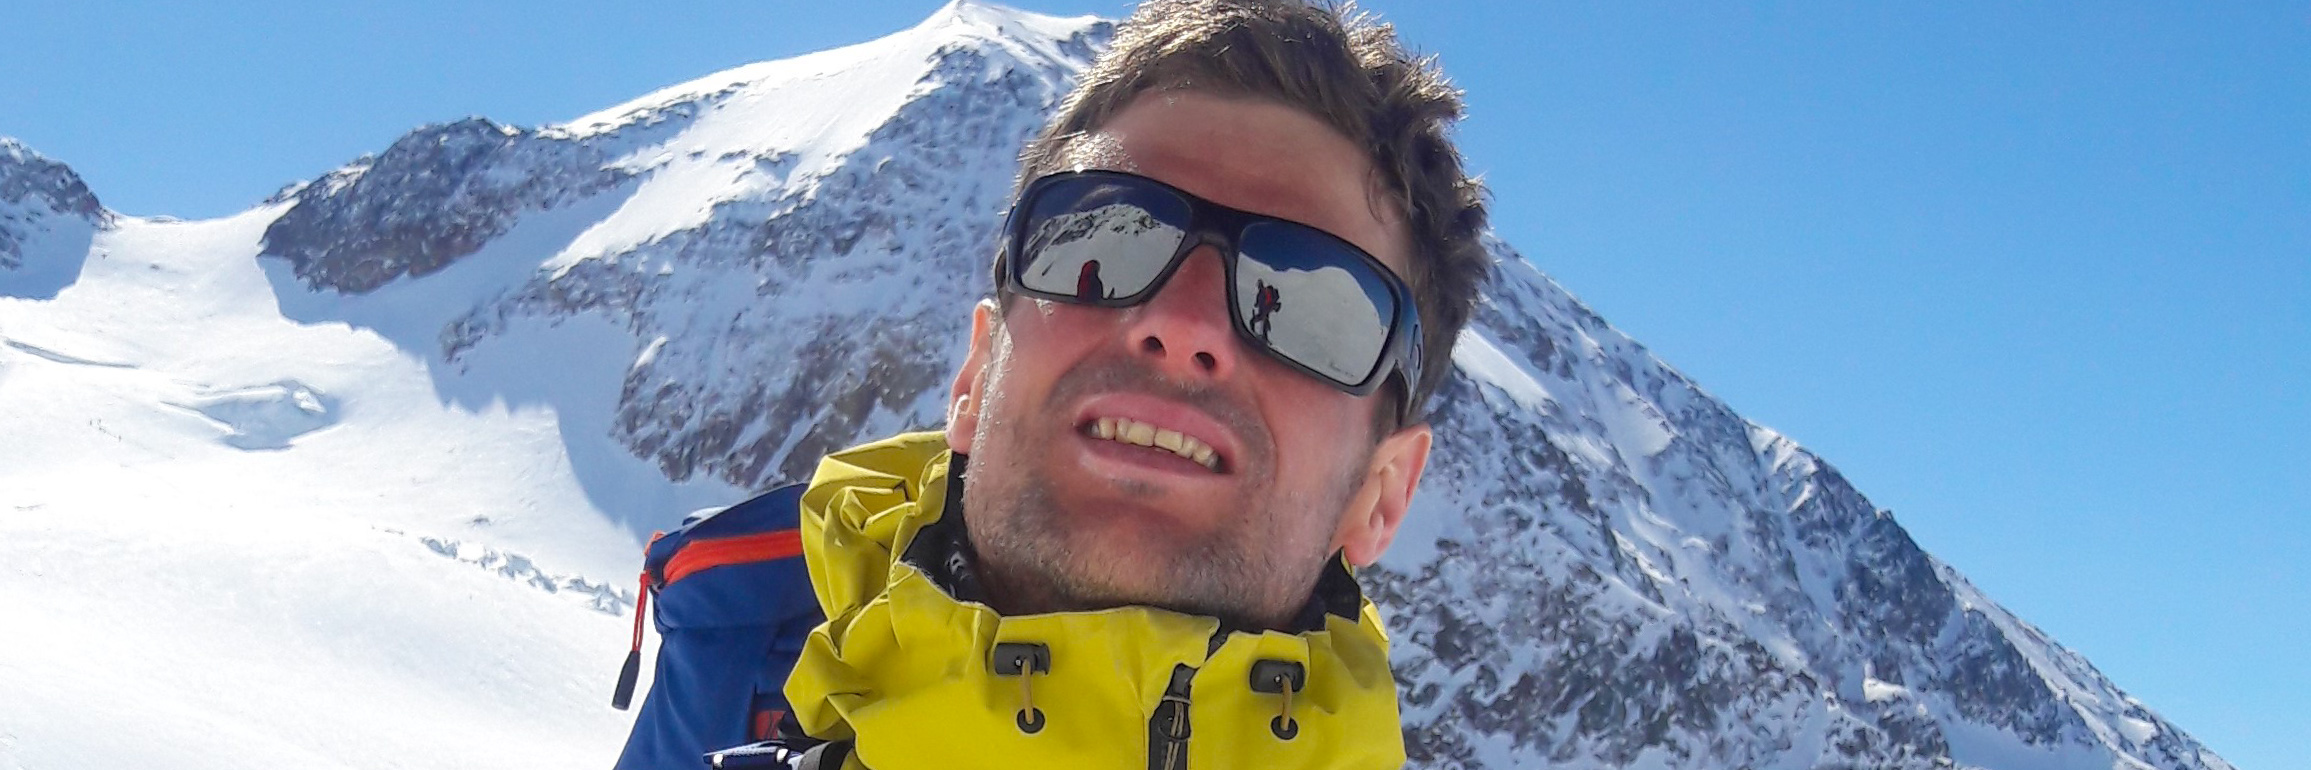 Daniel Obererlacher Bergführer, Skiführer, Ber und Skiführer Tirol